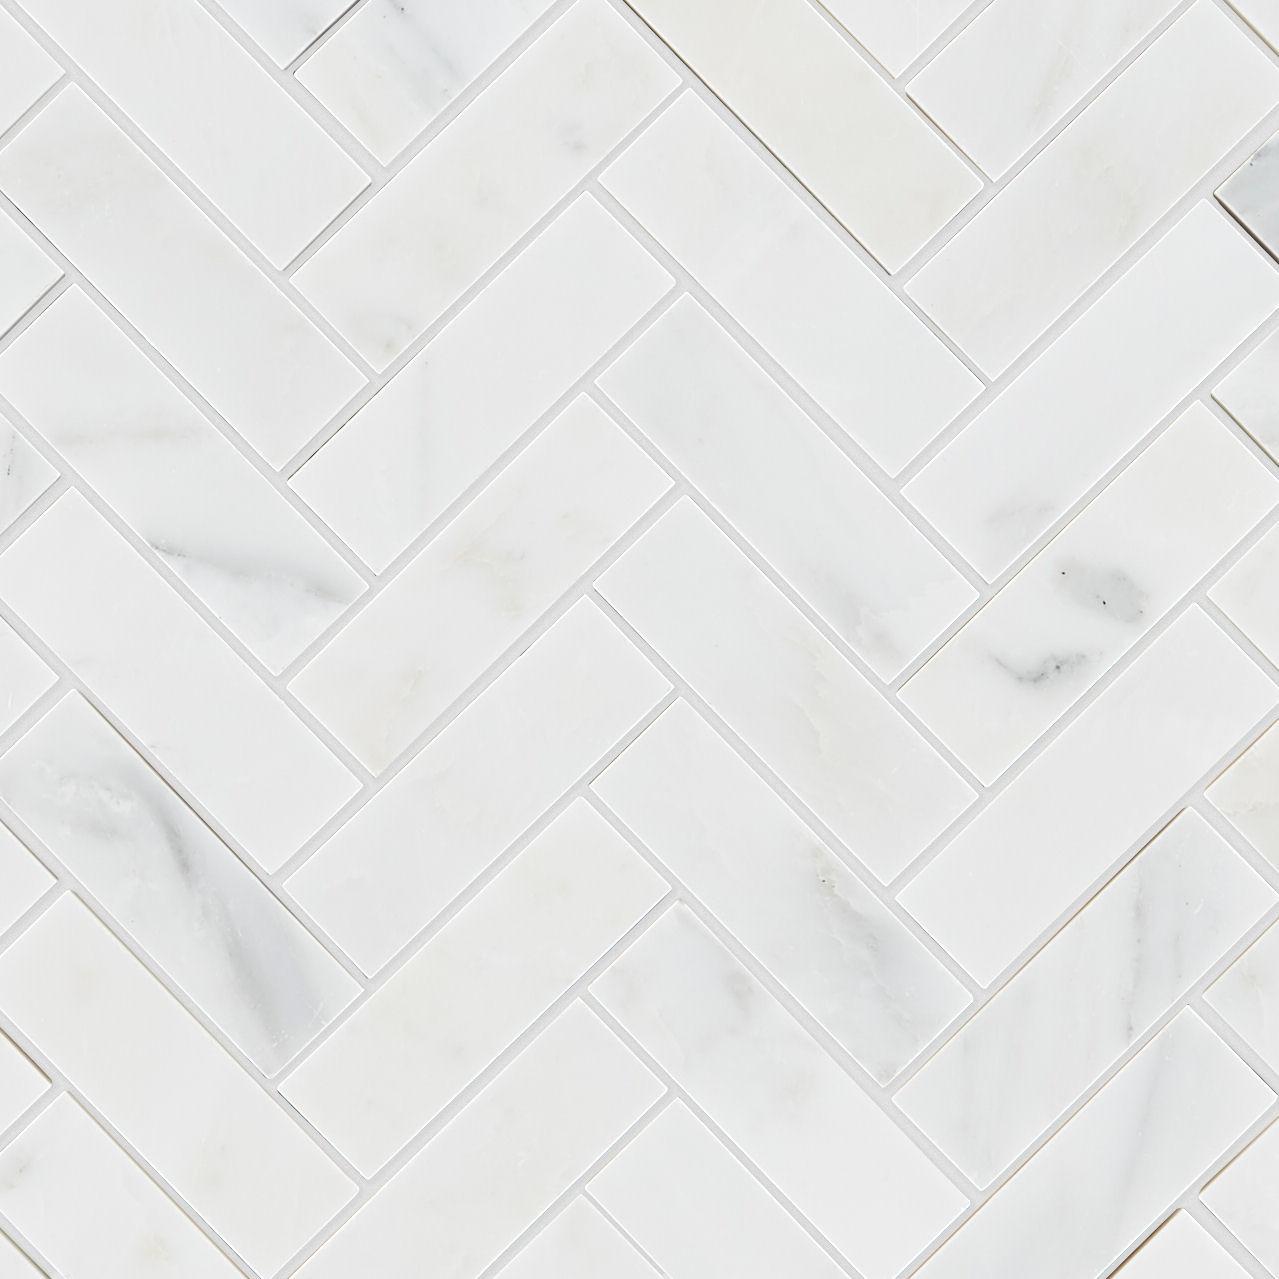 Herringbone Tiles Uk